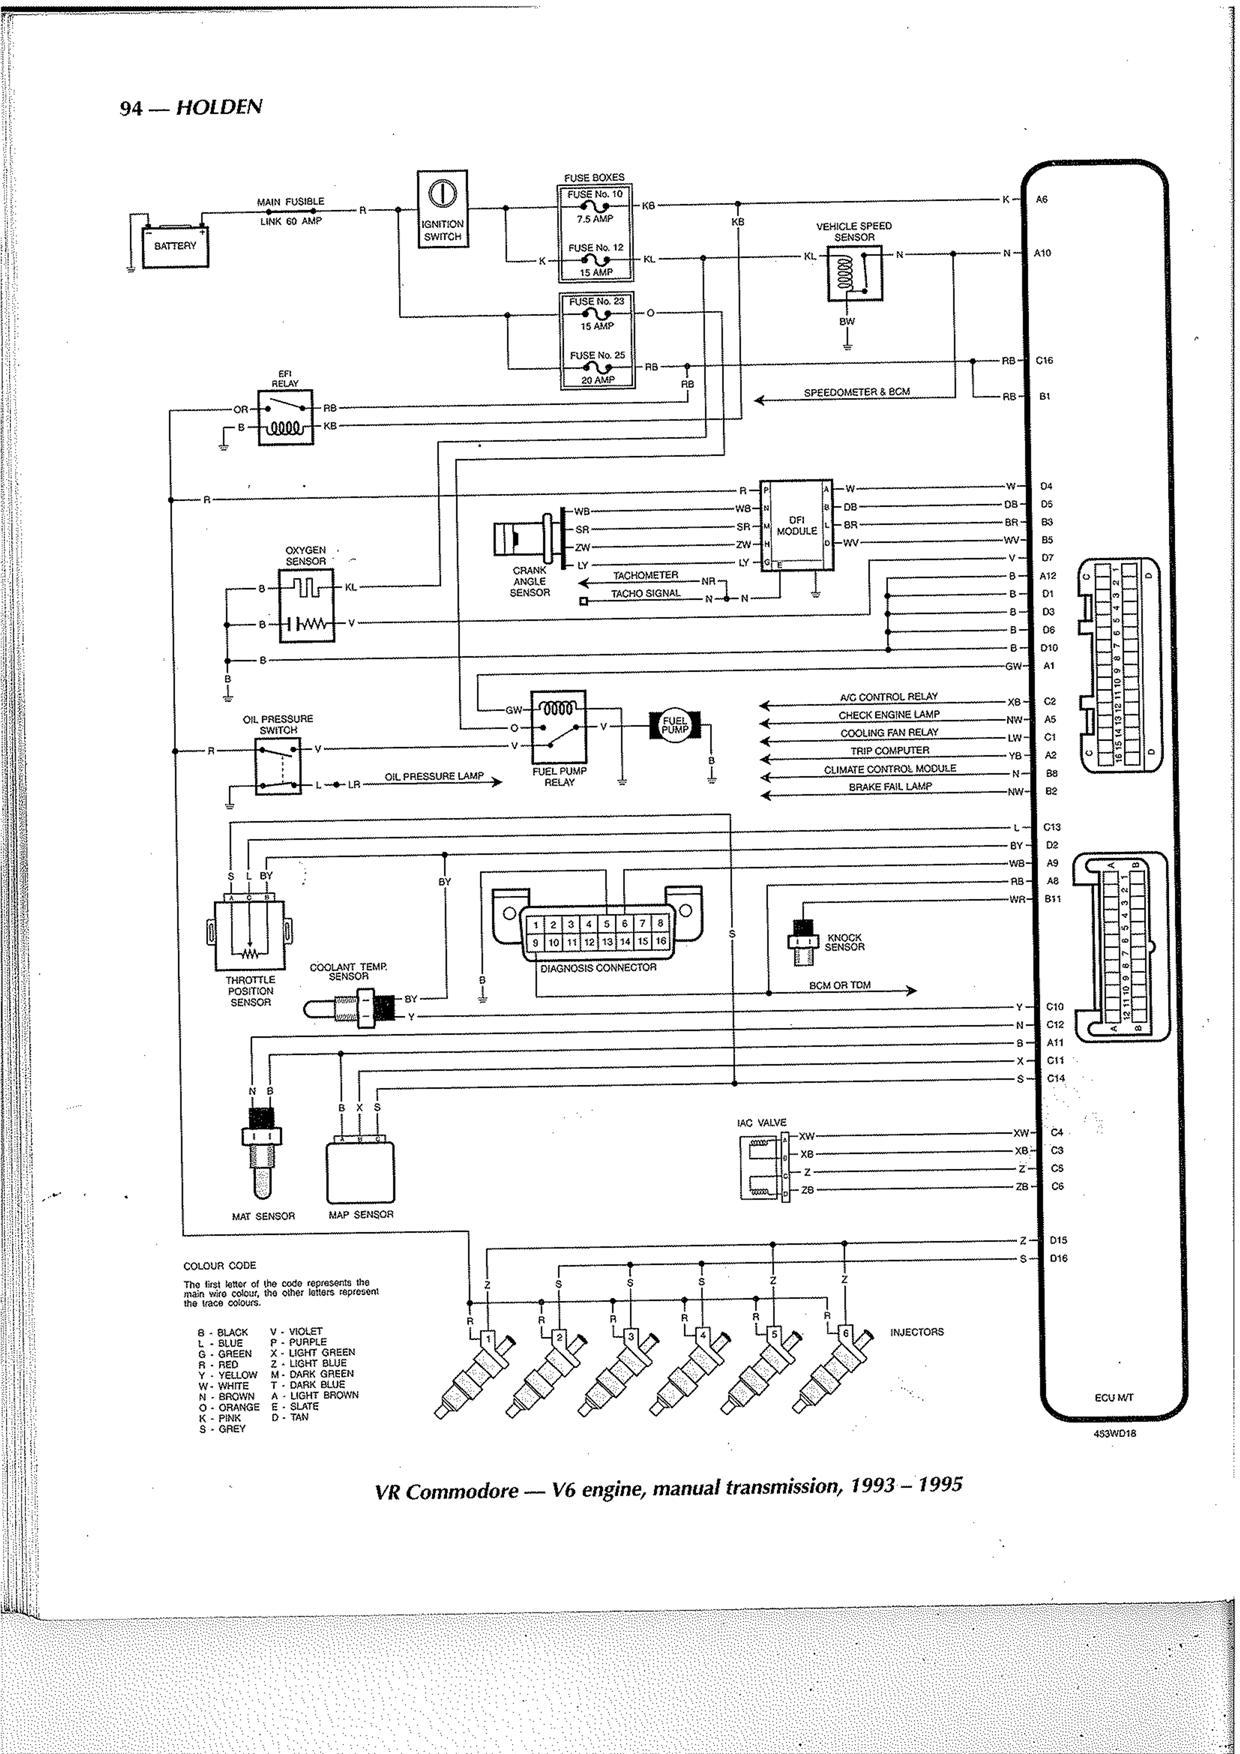 Vx Monaro Stereo Wiring Diagram